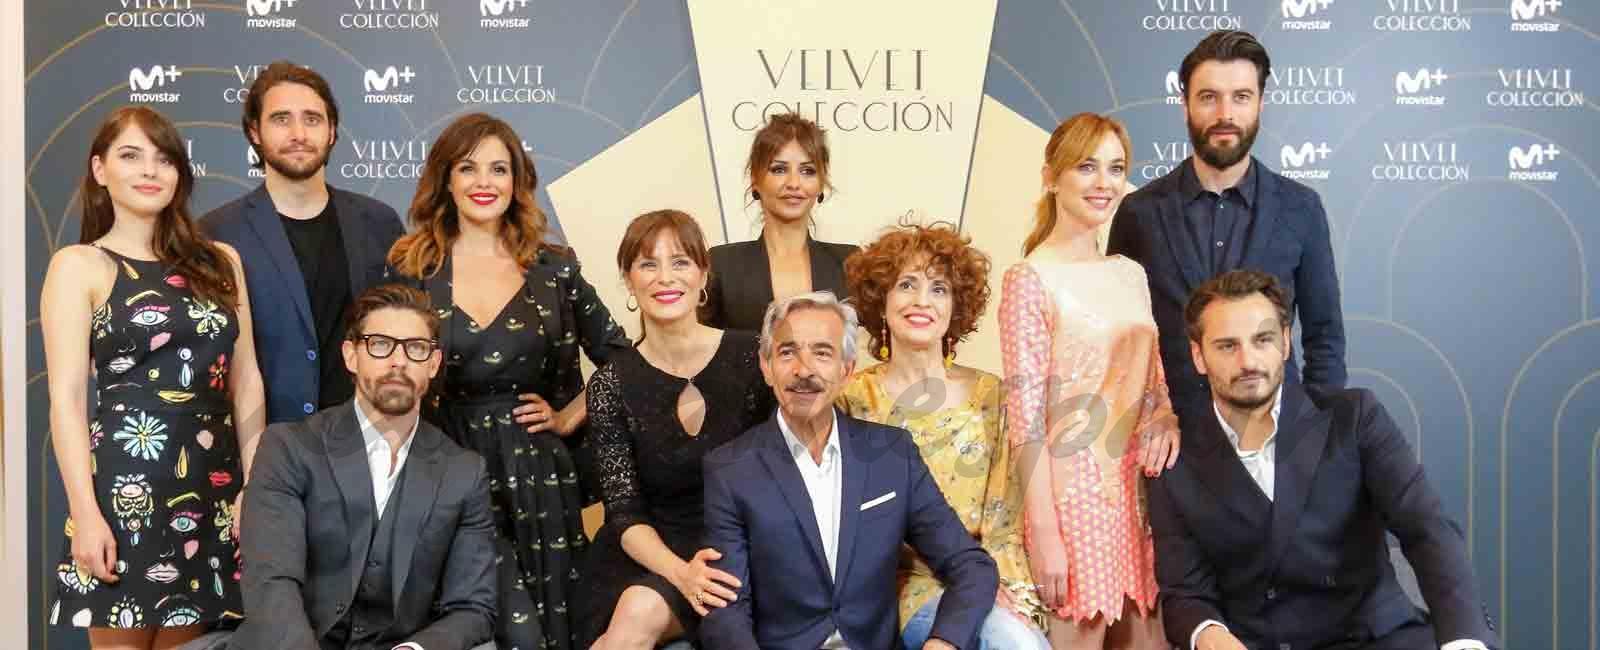 Imanol Arias, de «Cuéntame», a fichaje estrella para la próxima temporada de «Velvet»